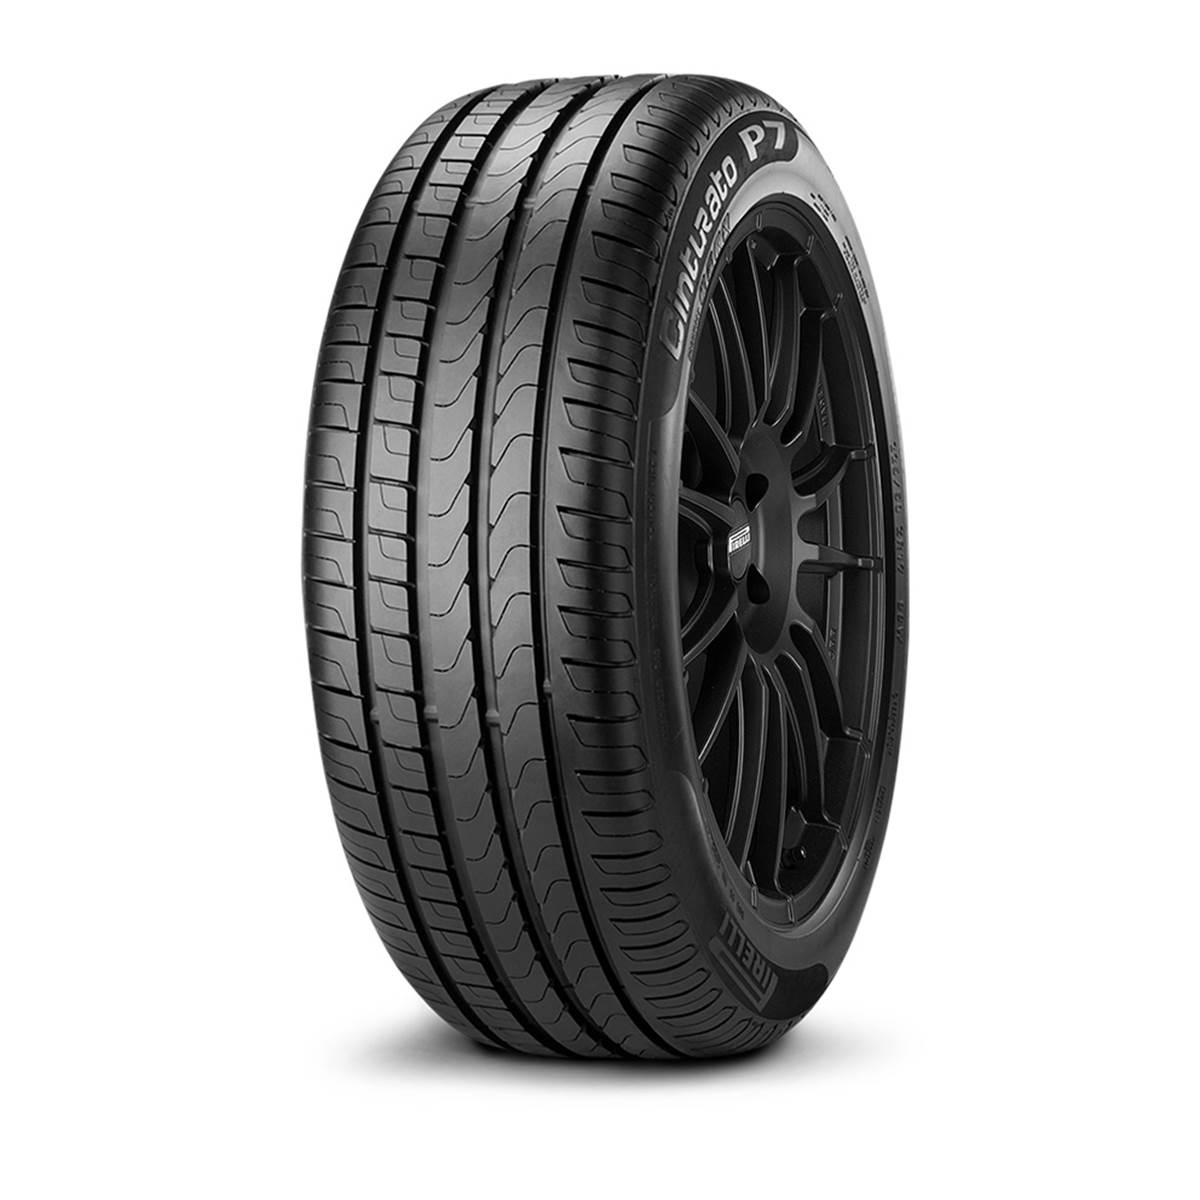 Pneu Pirelli 225/50R16 92W Cinturato P7